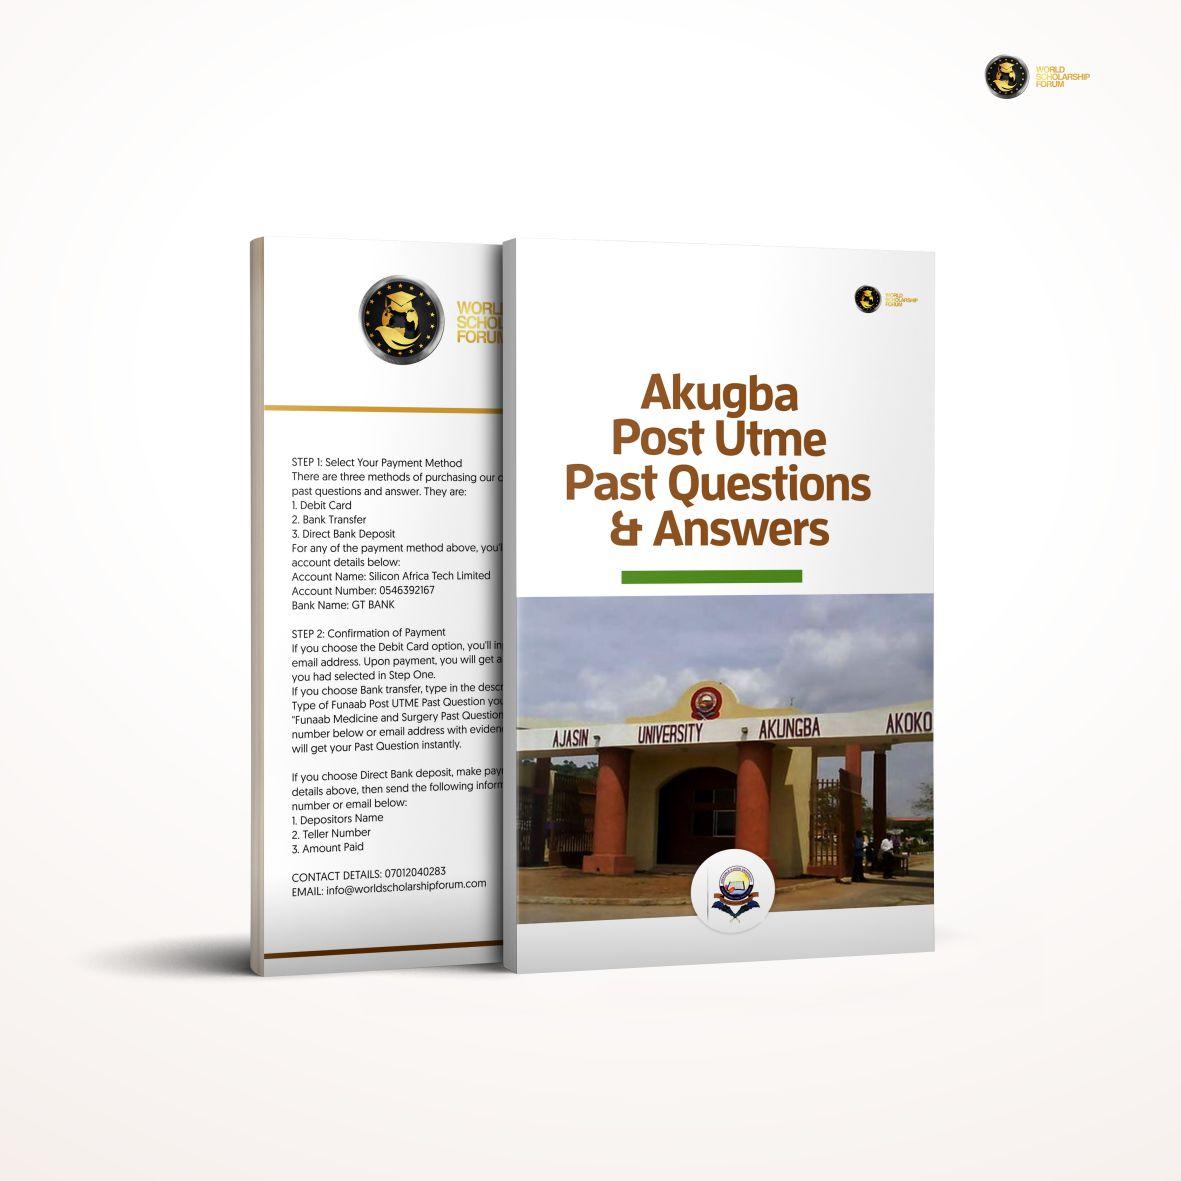 akugba-post-utme-past-question